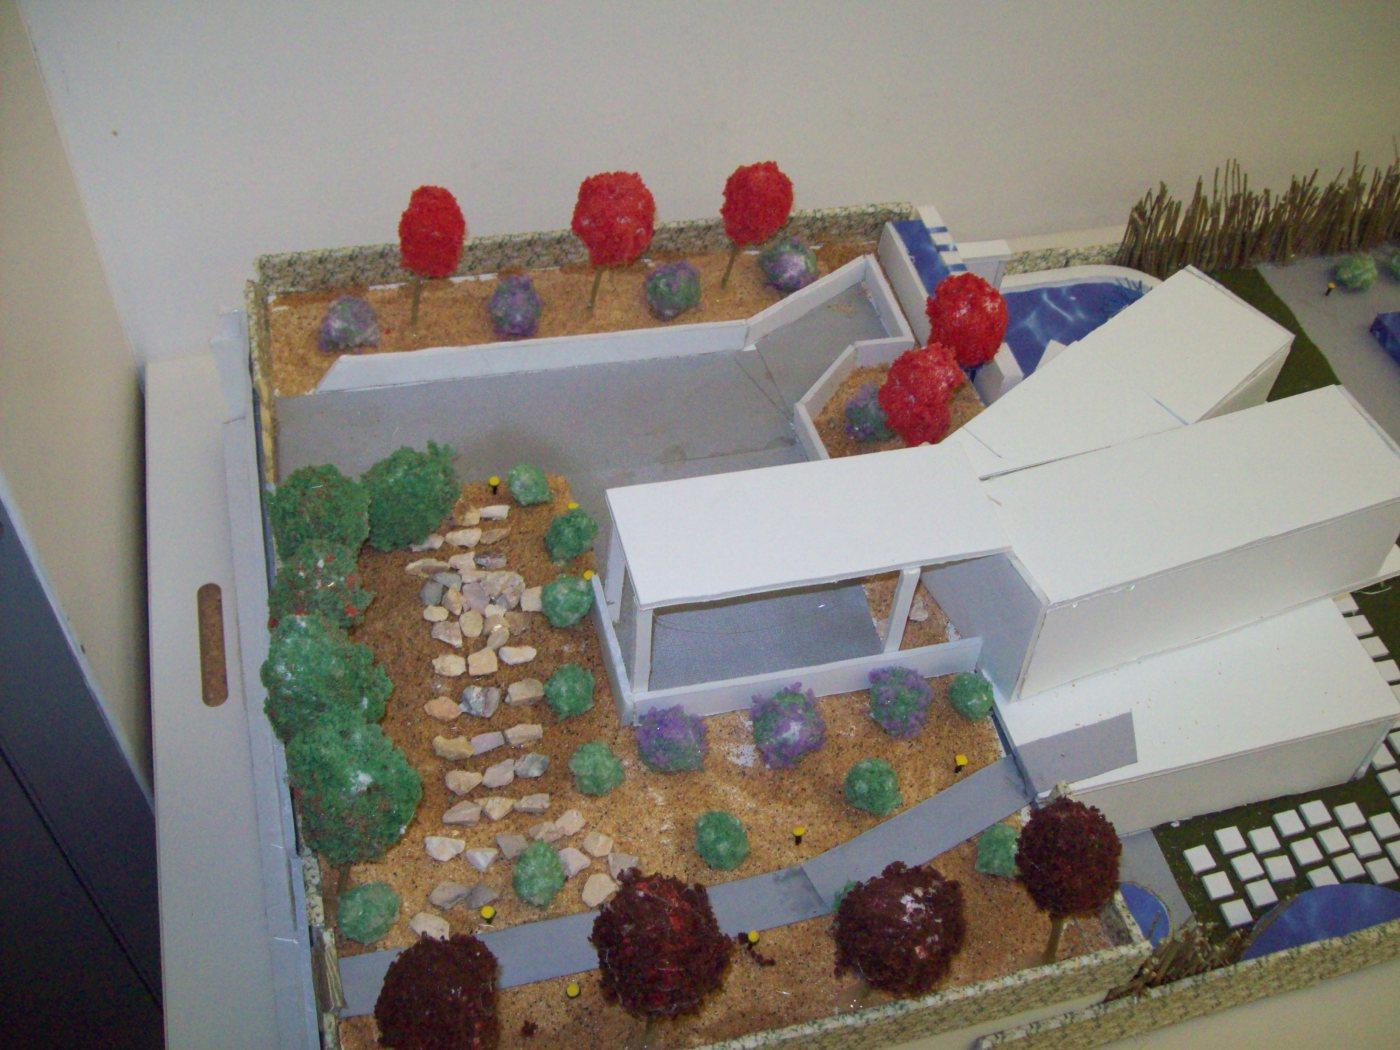 Residential Landscape Model 1/4″ scale